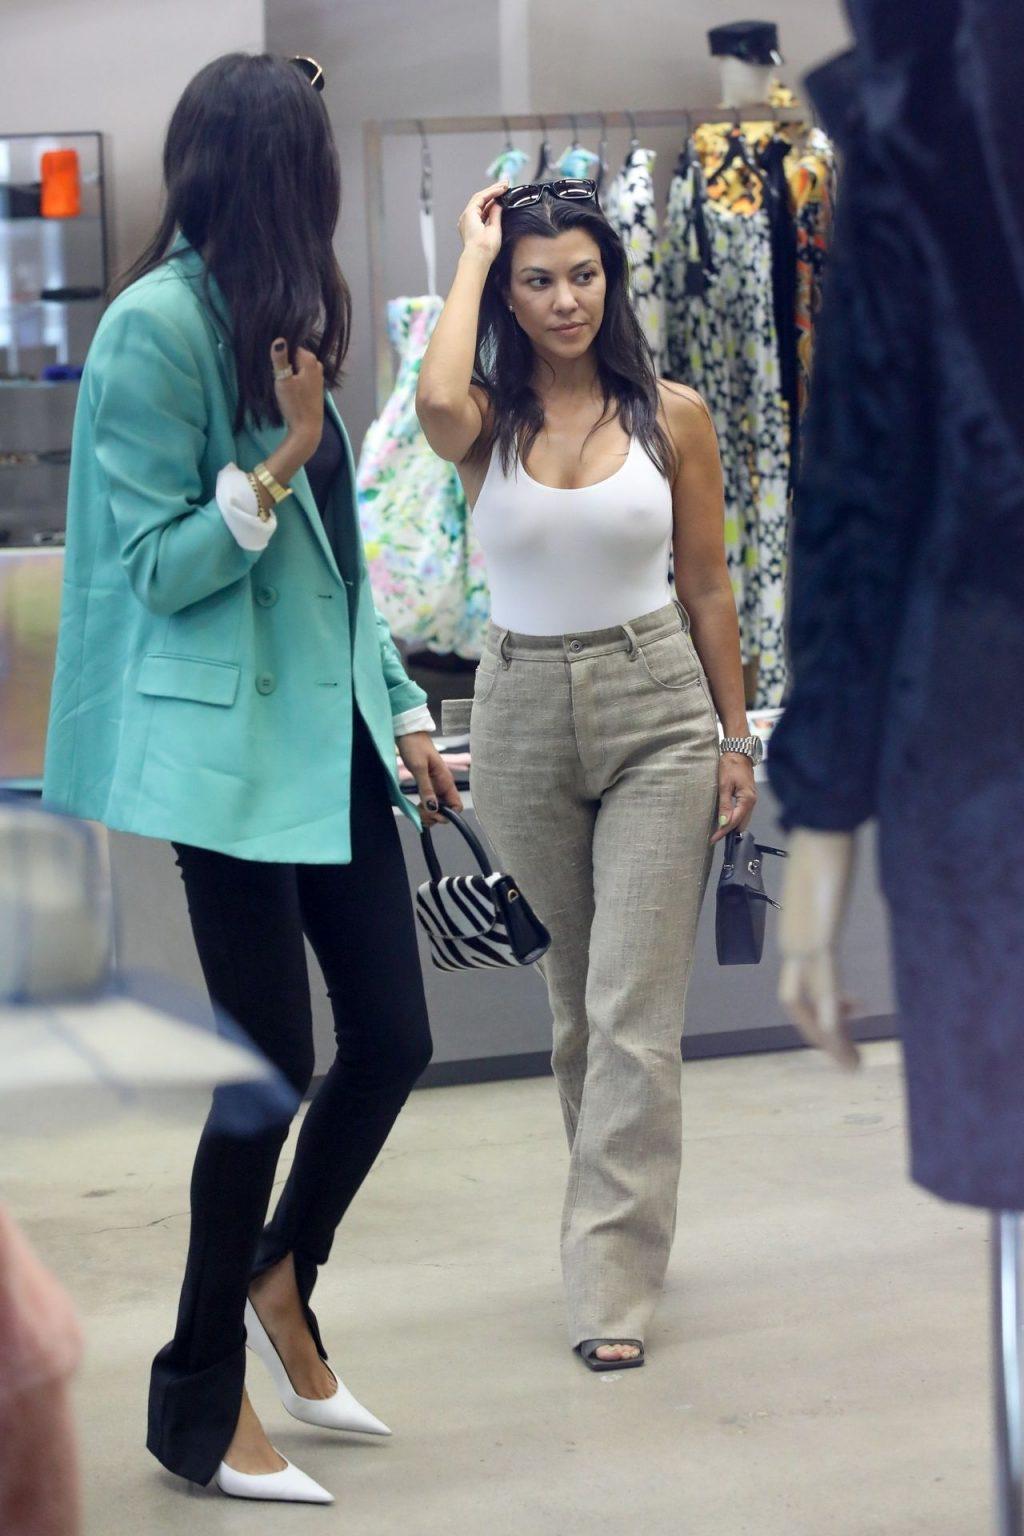 Kourtney Kardashian See Through Thefappeningblog Com 136 102